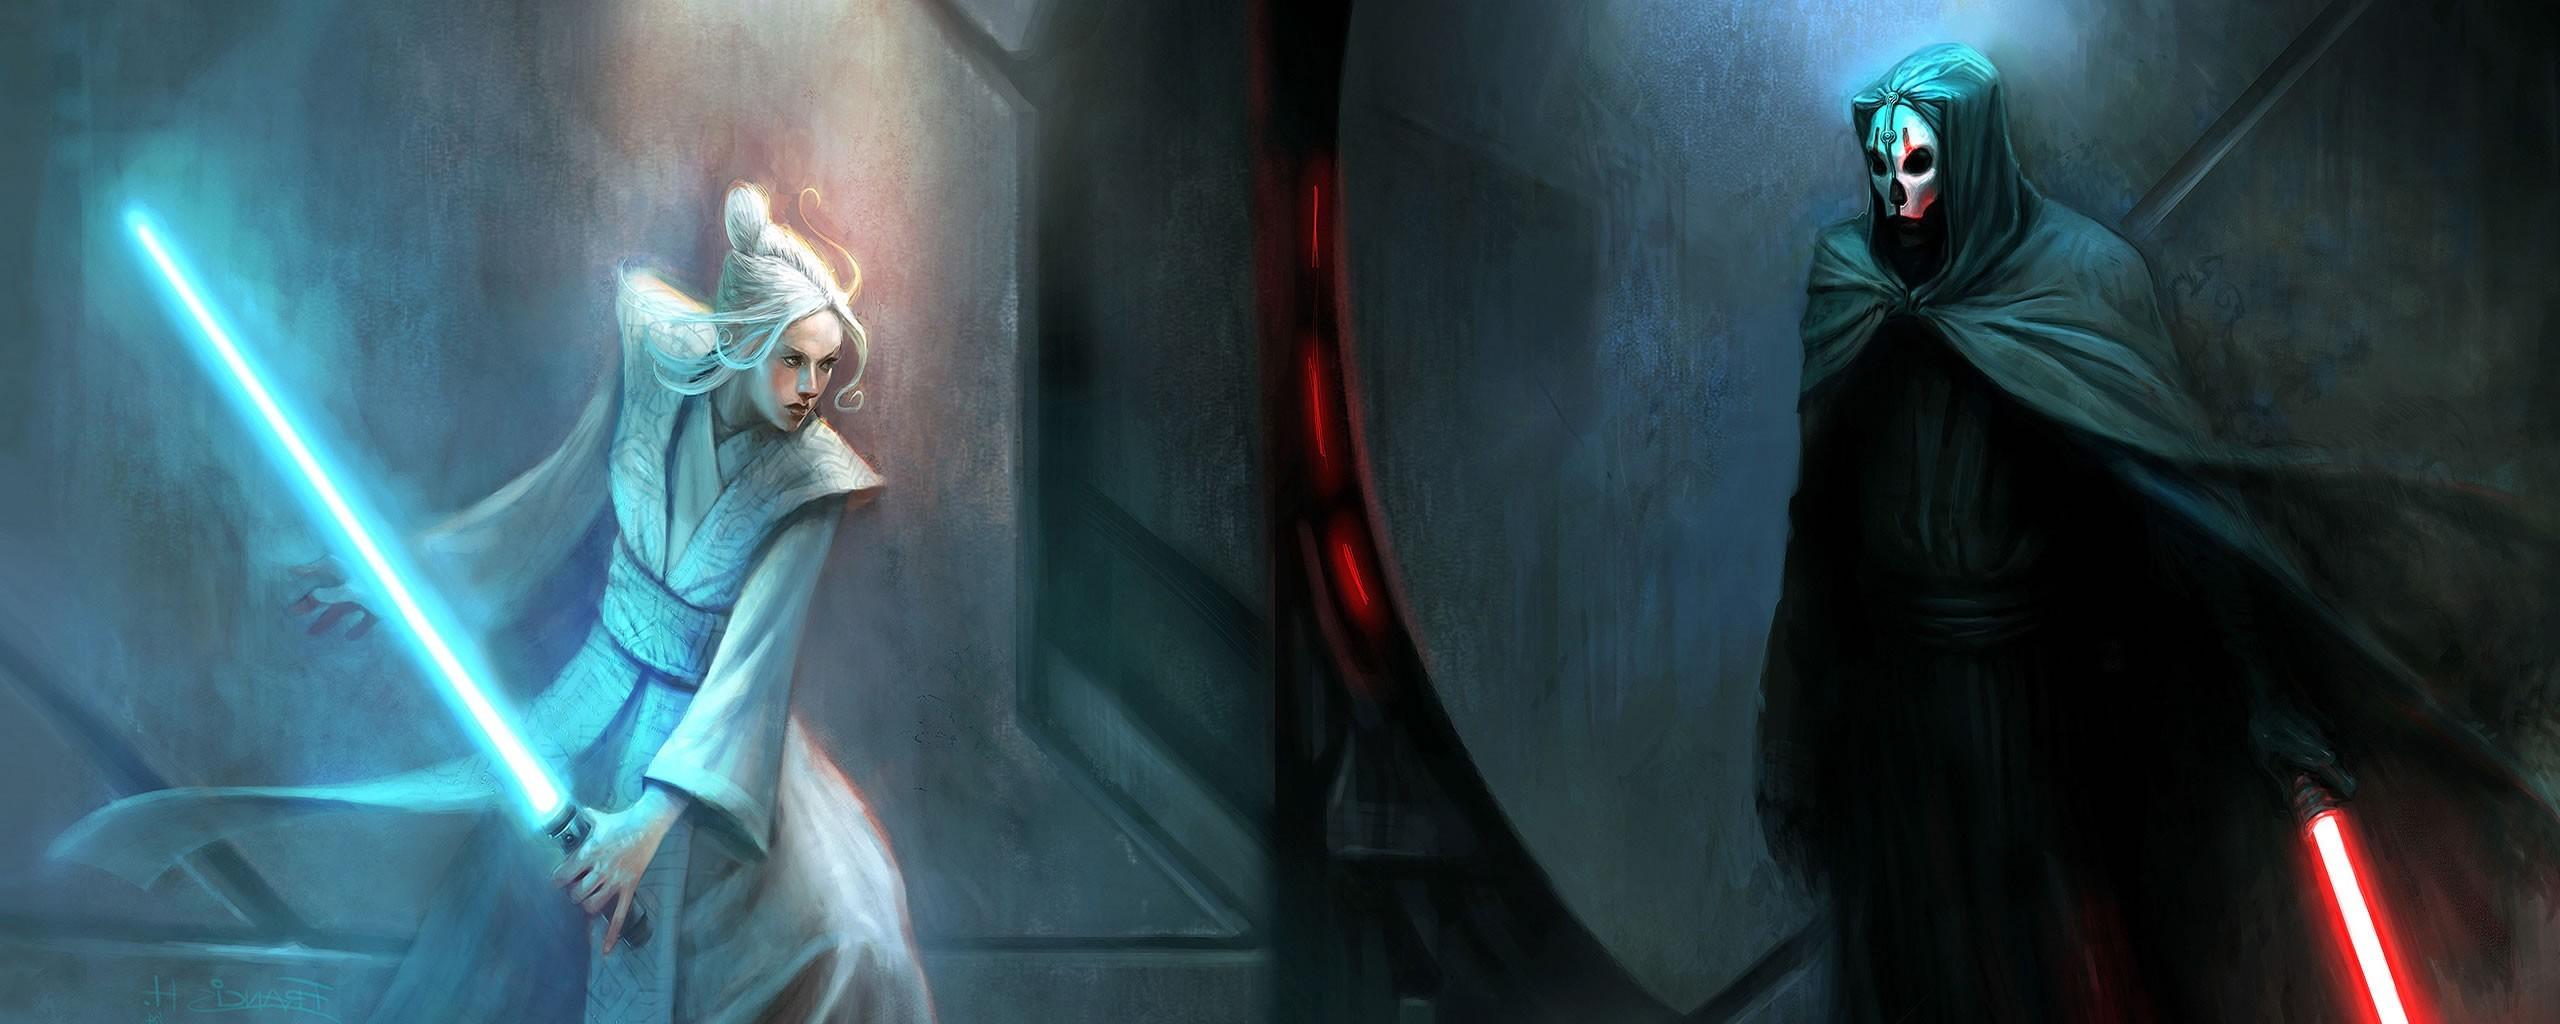 Star Wars Atris Jedi Sith Darth Nihilus Wallpaper And Darth Nihilus Desktop Background 1413668 Hd Wallpaper Backgrounds Download